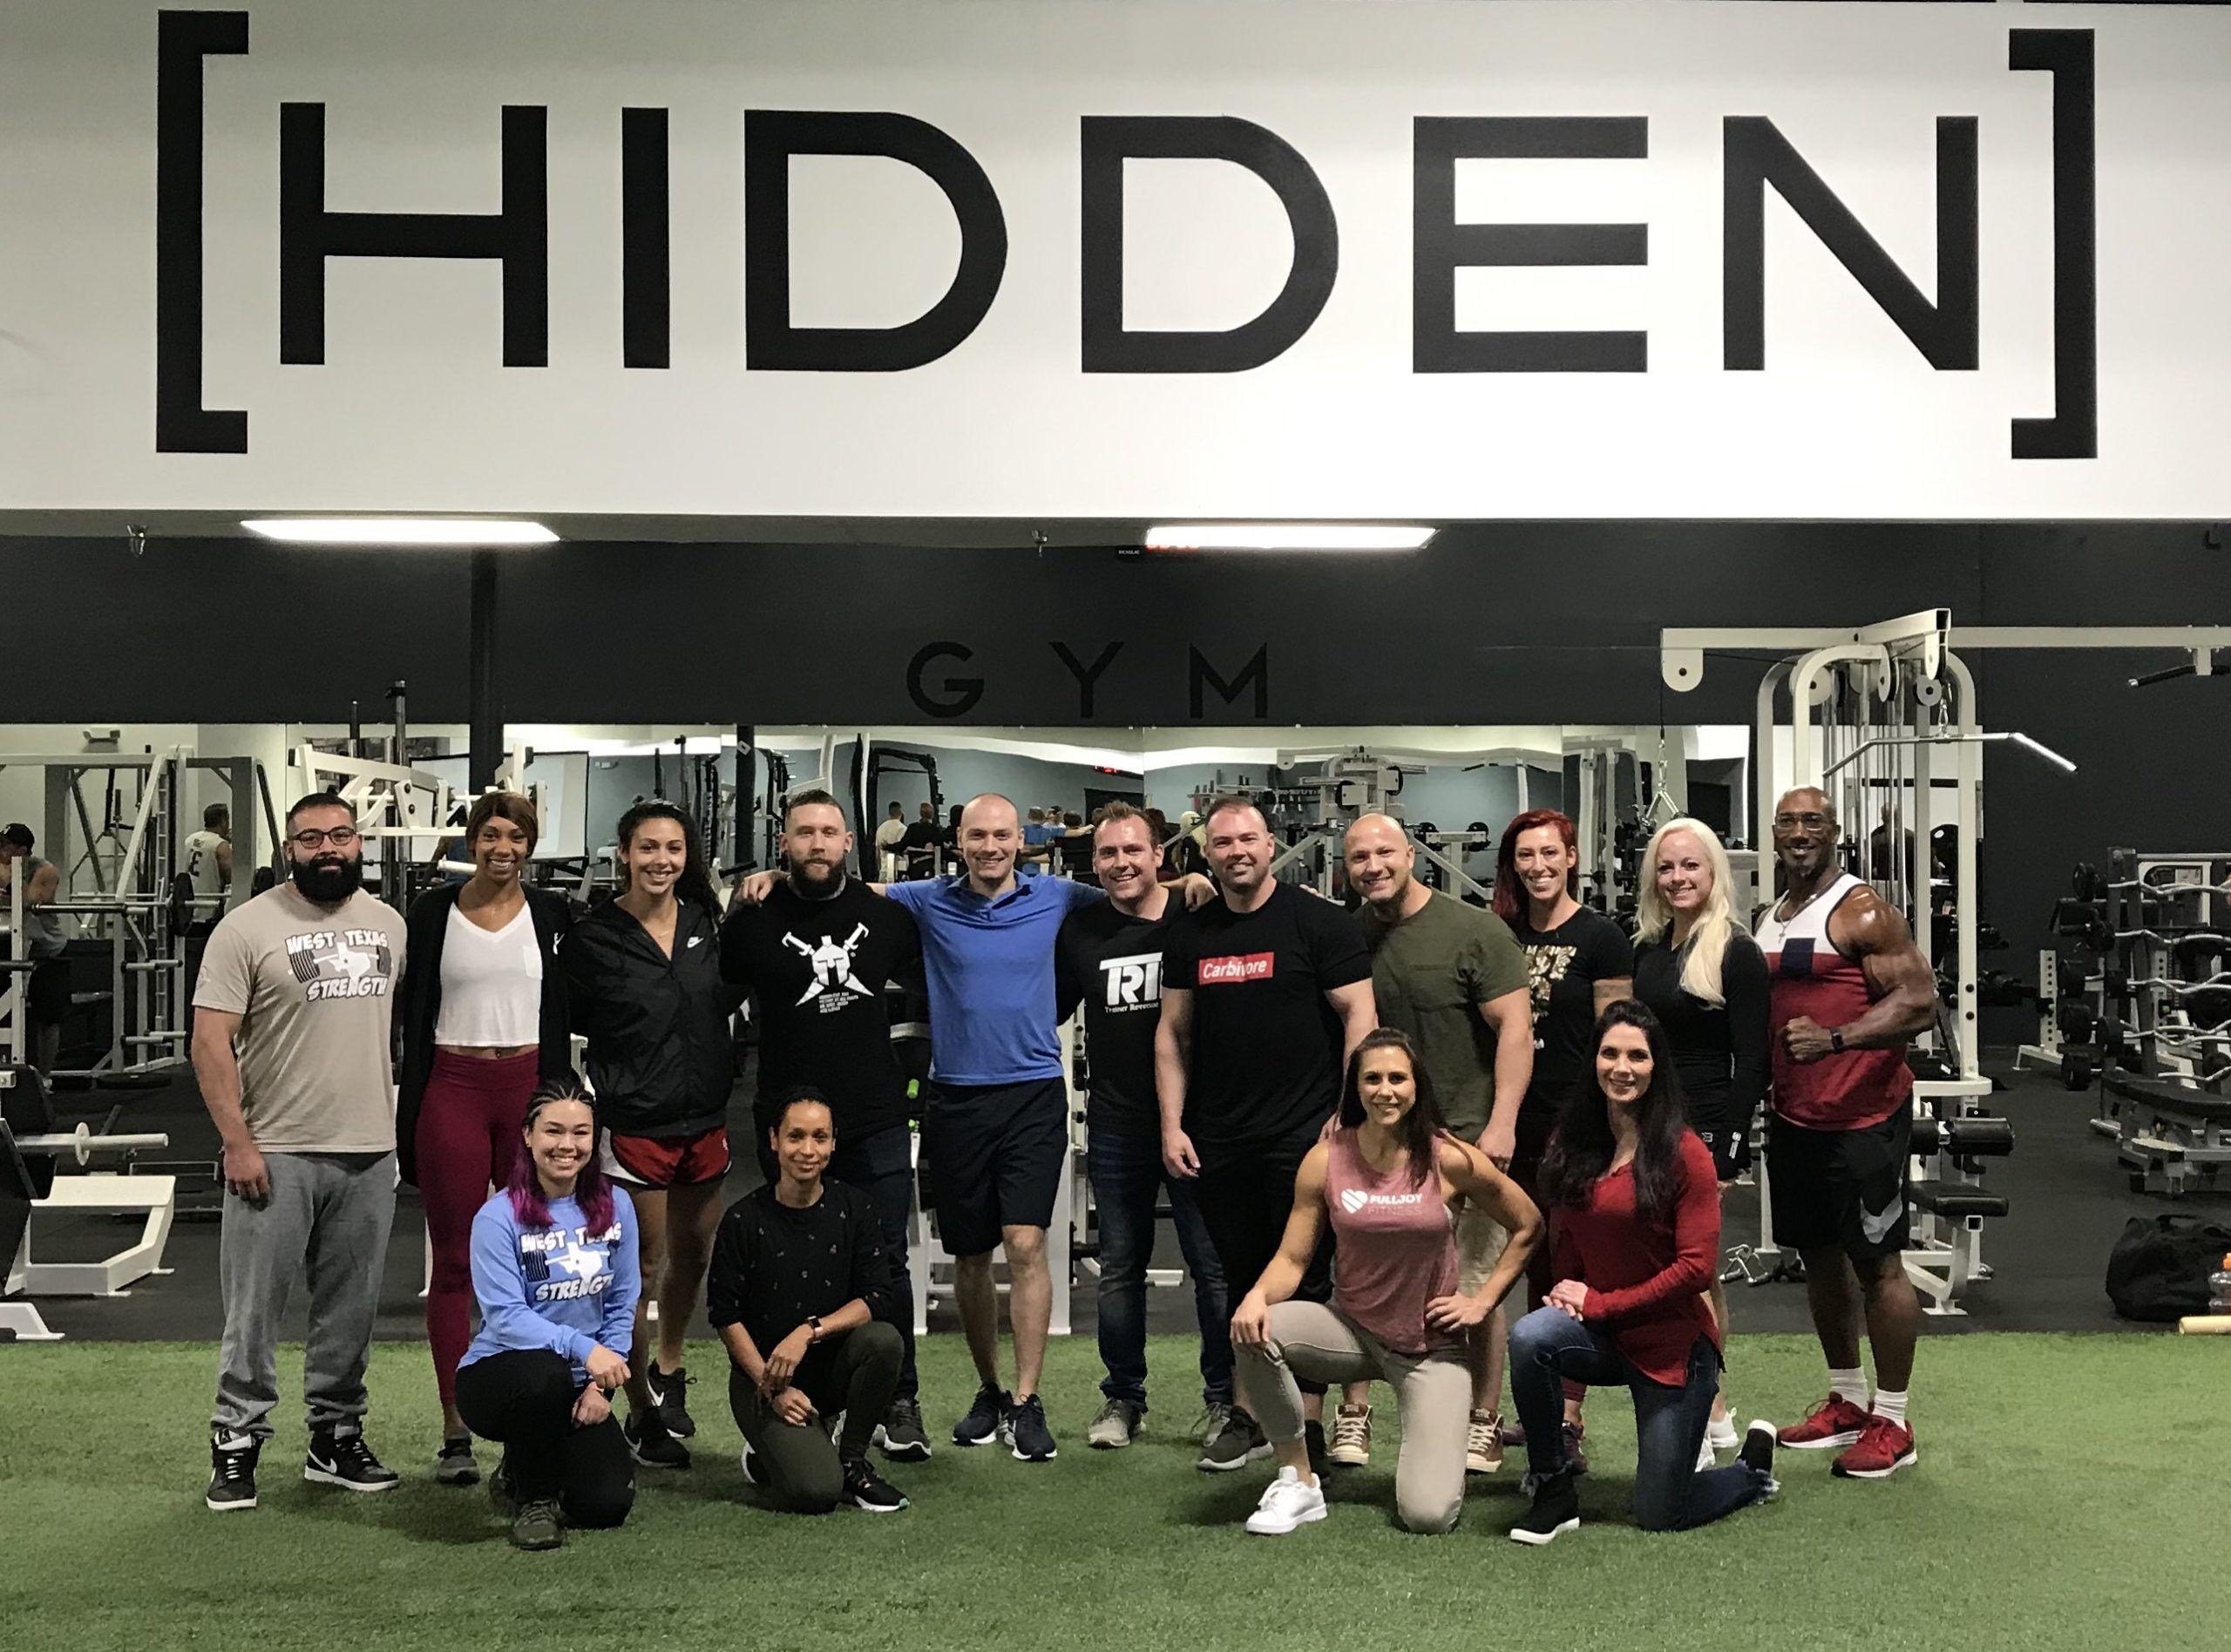 hidden gym team